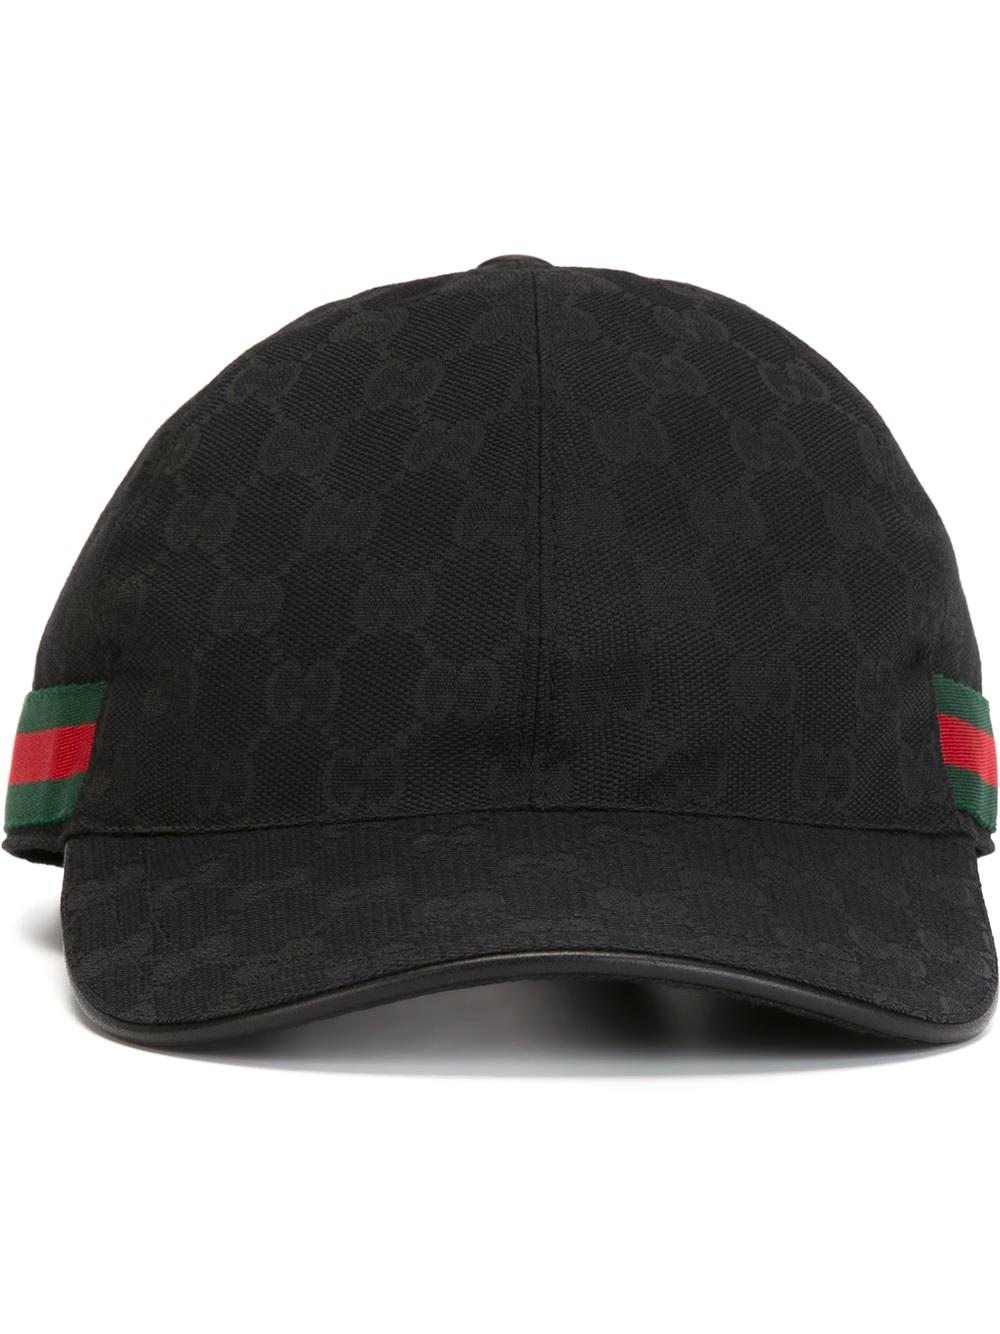 Lyst - Gucci Original Gg Canvas Baseball Hat for Men 552c6f52304